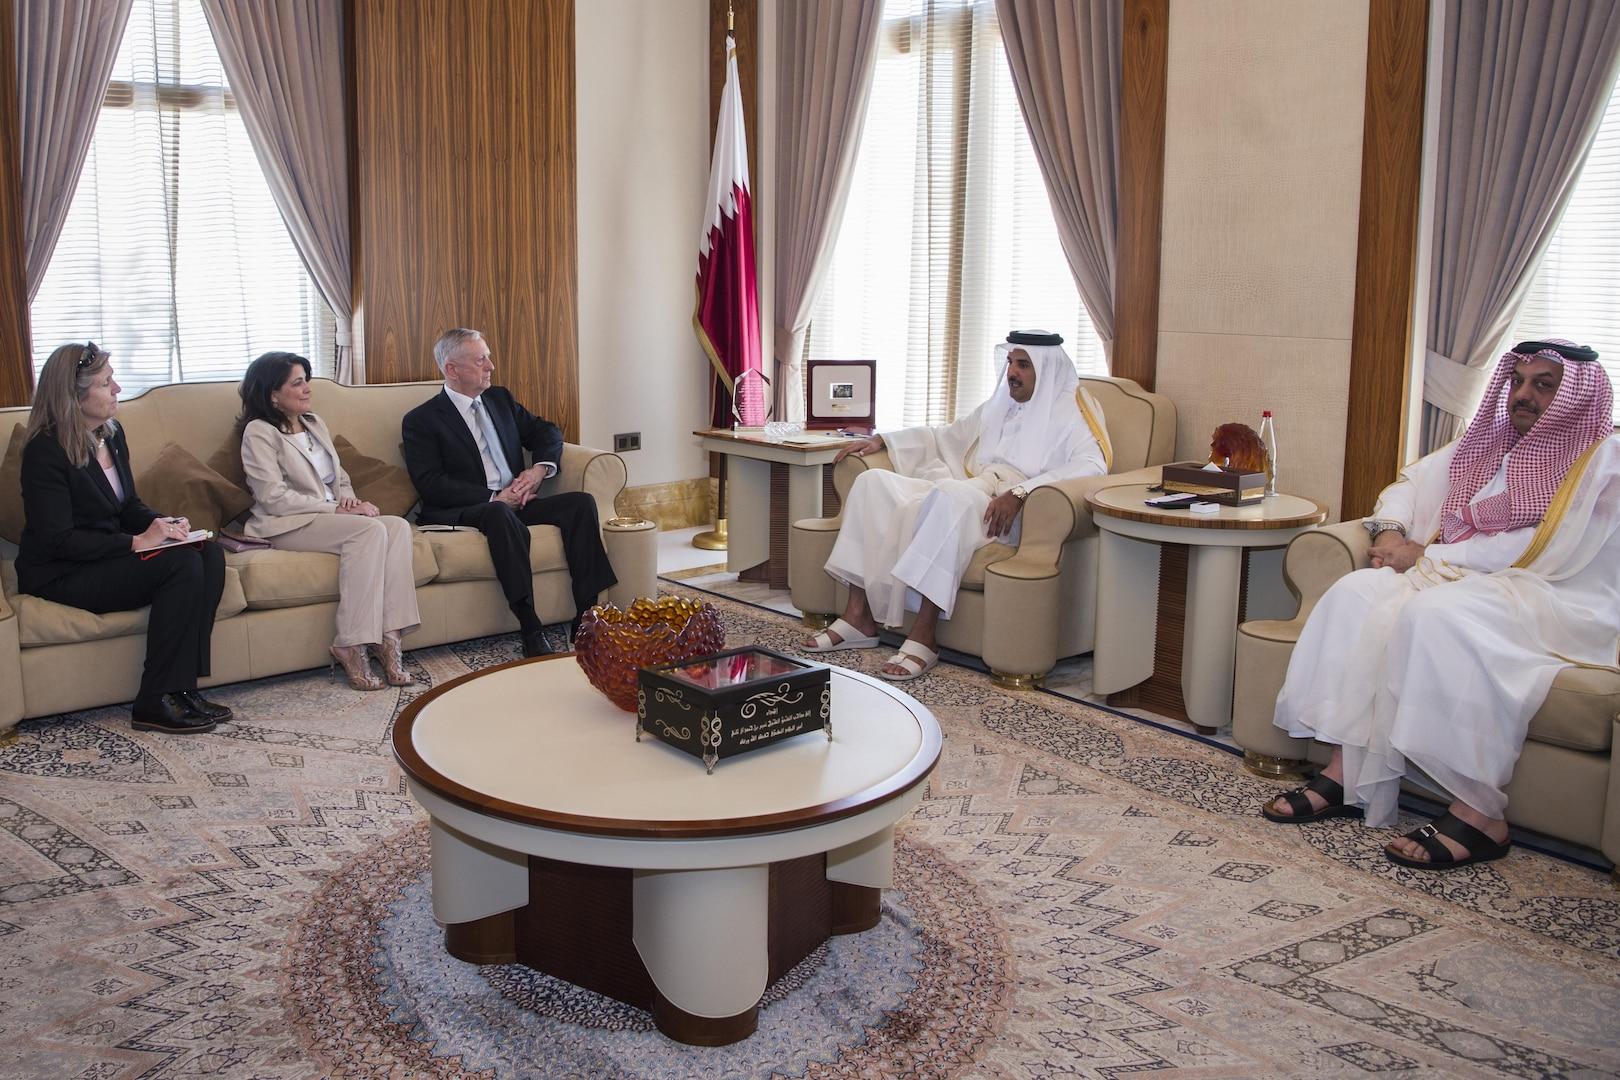 Defense Secretary Jim Mattis meets with Qatar's Emir Sheikh Tamim bin Hamad Al Thani at the Sea Palace in Doha, Qatar, April 22, 2017. Sitting to Mattis' left are his advisor, Sally Donnelly, and Dana Smith, U.S. ambassador to Qatar. DoD photo by Air Force Tech. Sgt. Brigitte N. Brantley